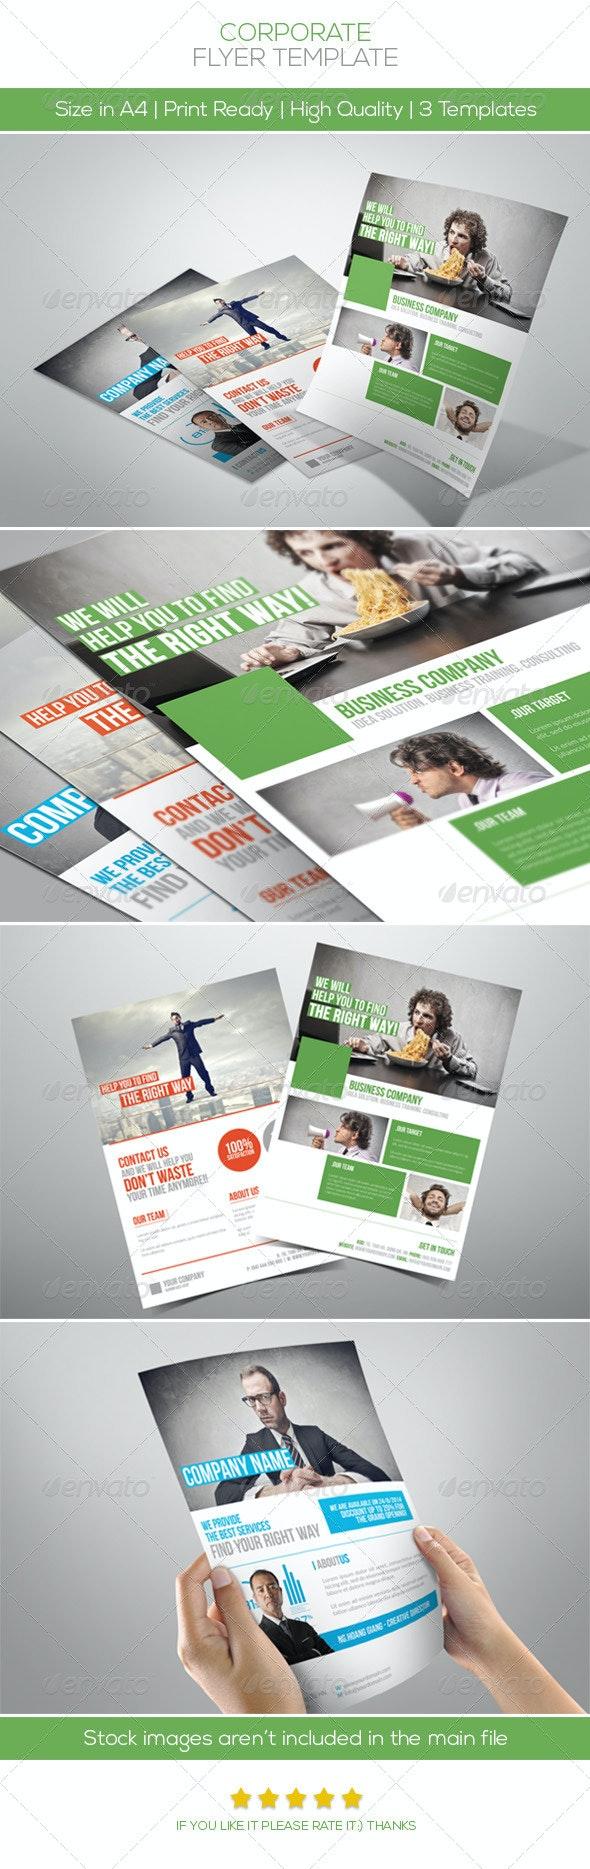 Premium Corporate Flyers Vol.3 - Corporate Flyers